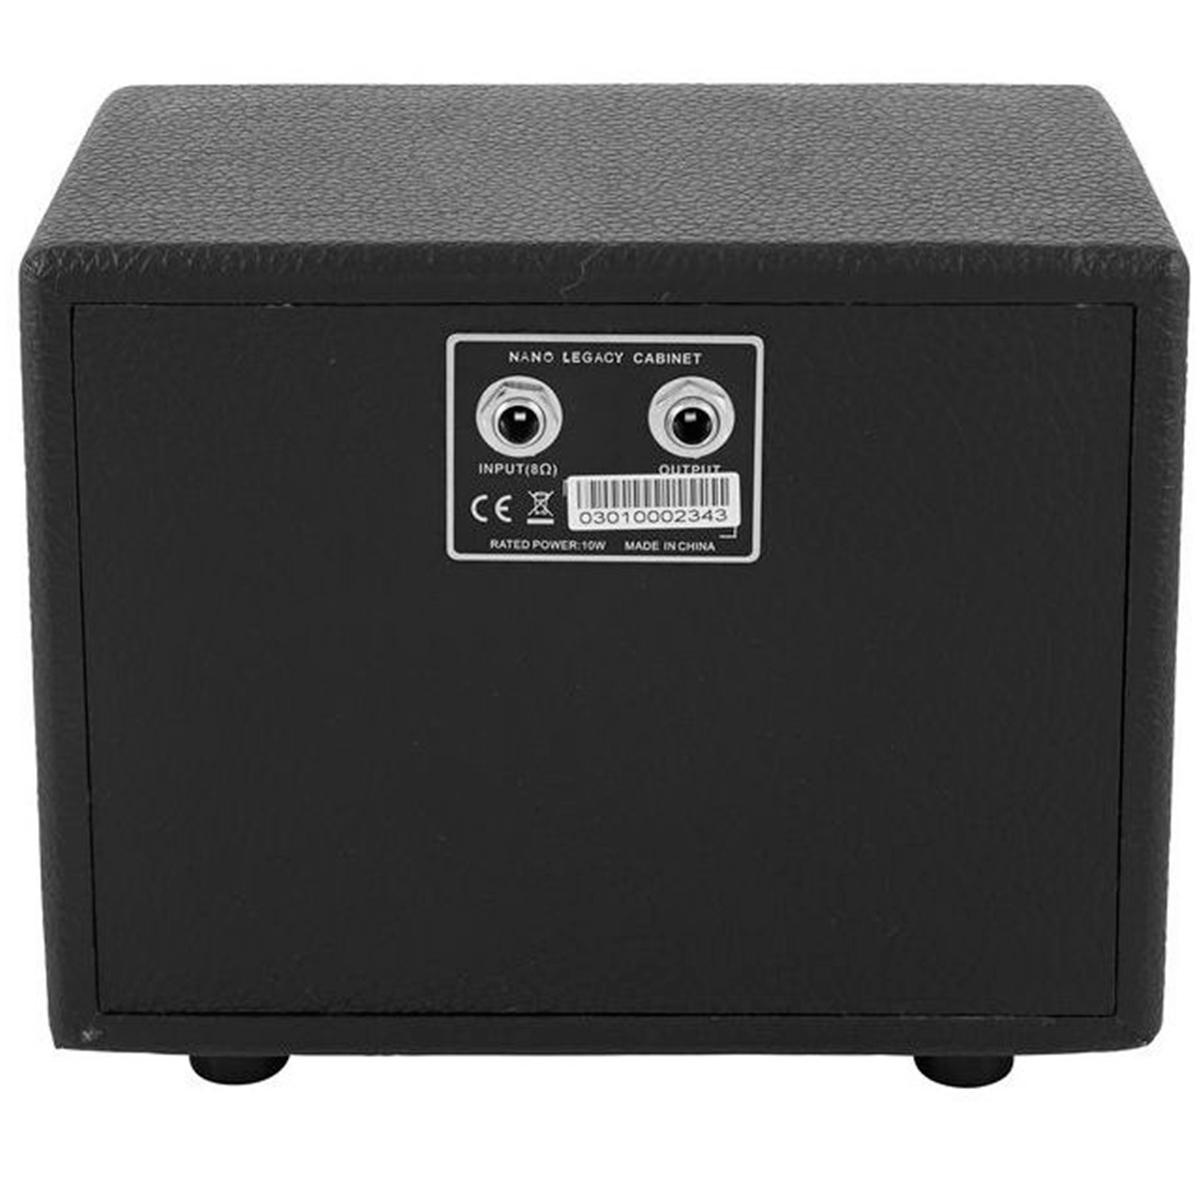 Cubo Ativo p/ Guitarra Fal 4,5 Pol 15W - Nano Legacy Cabinet NLC 1 Hotone